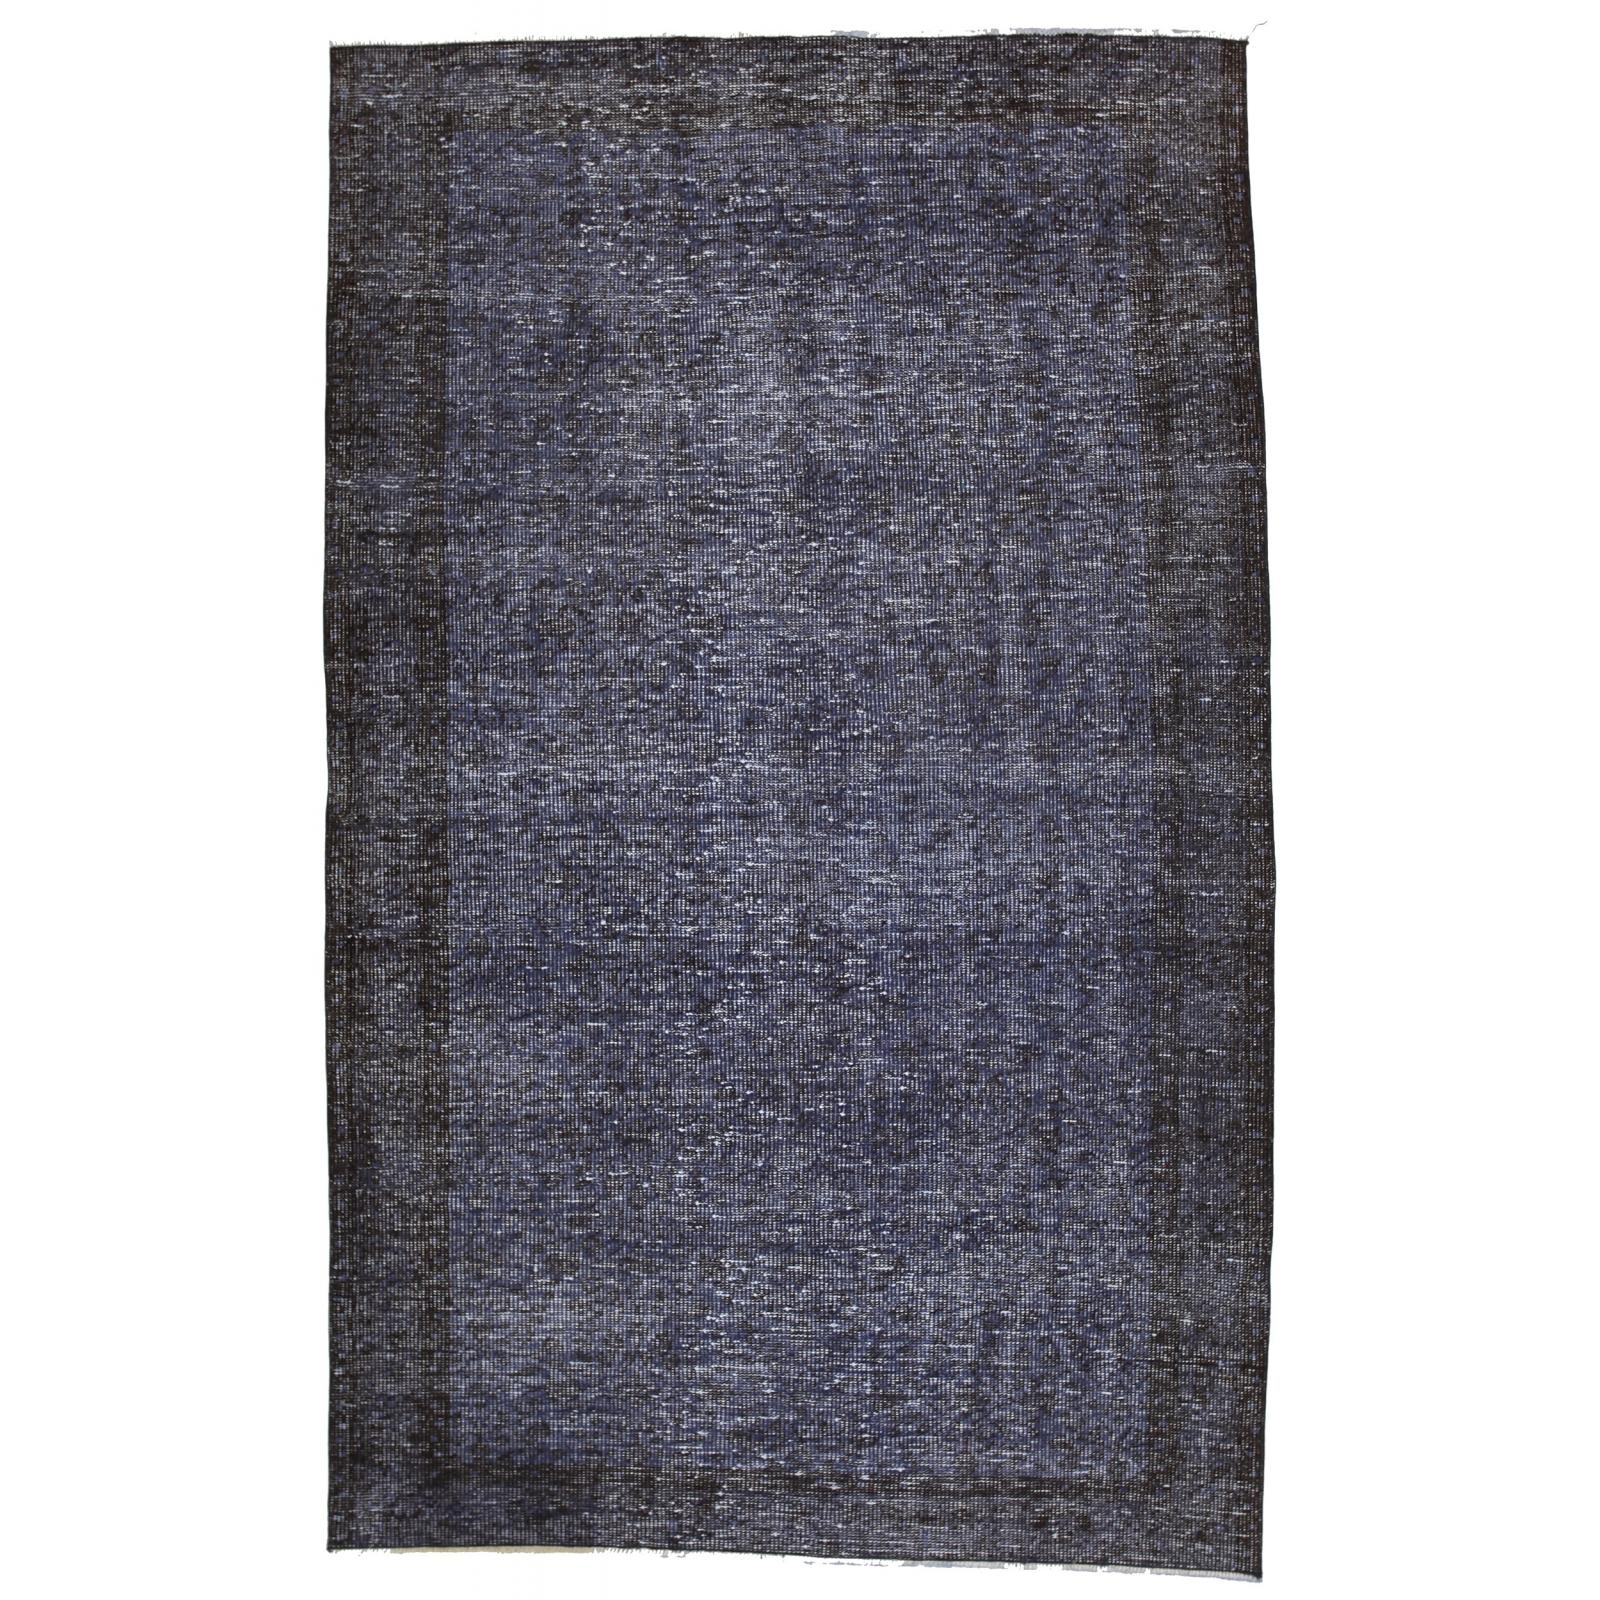 gris vintage tapis recolor s 149x243cm. Black Bedroom Furniture Sets. Home Design Ideas